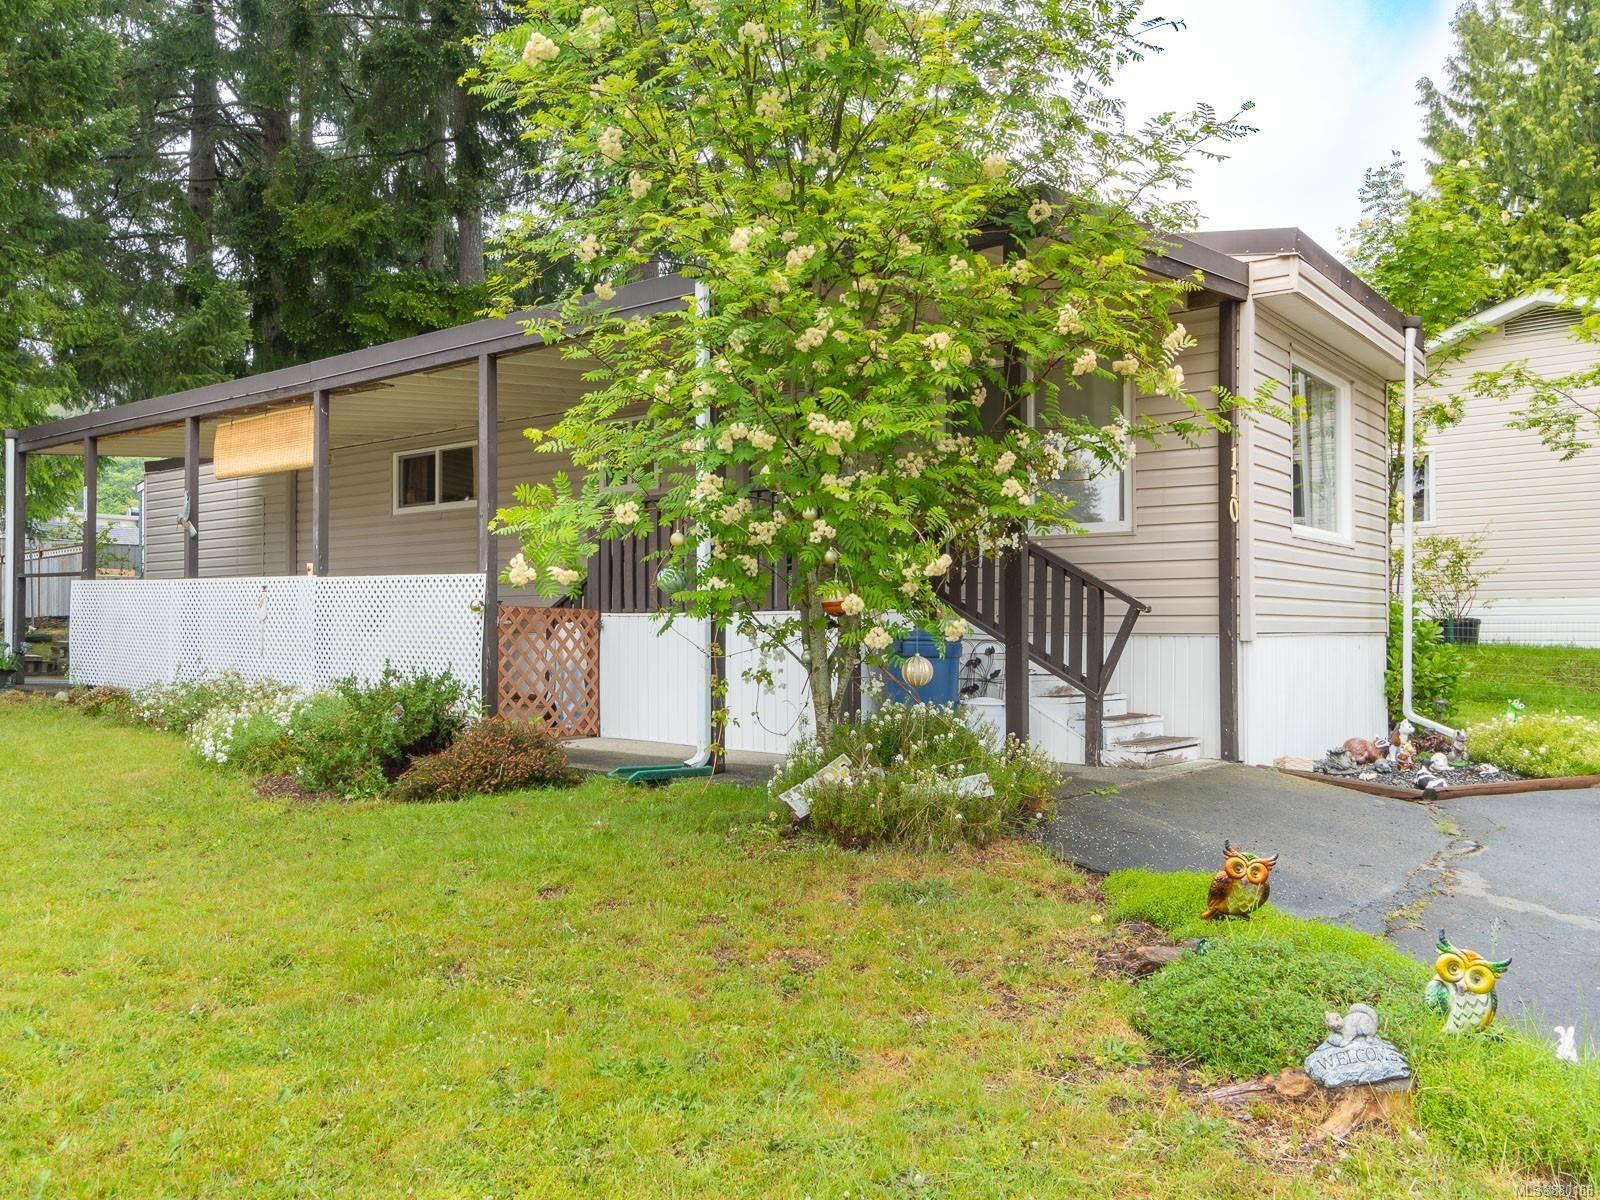 Main Photo: 110 5854 Turner Rd in Nanaimo: Na North Nanaimo Manufactured Home for sale : MLS®# 880166